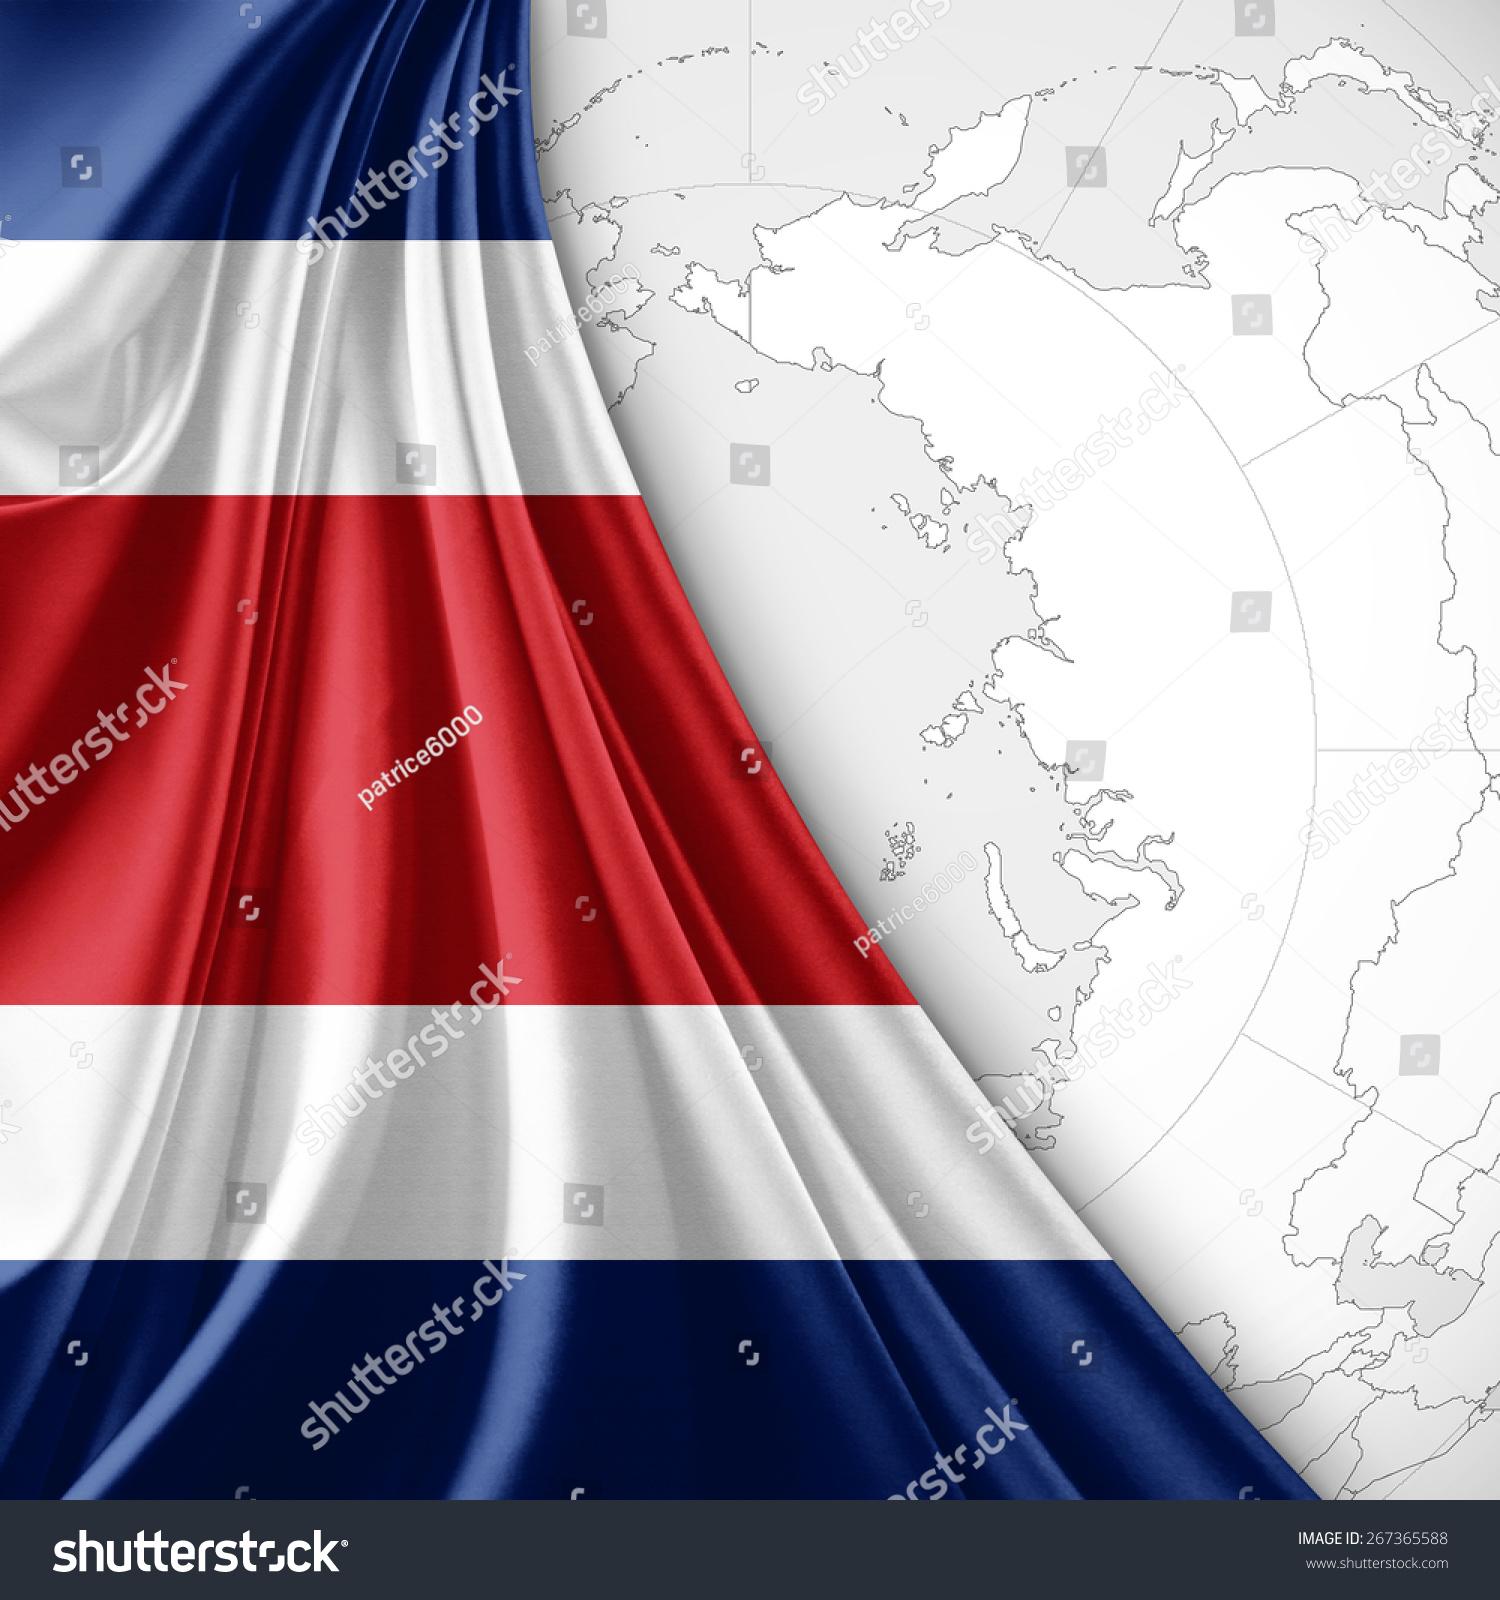 Costa Rica Flag World Map Background Stock Illustration - Royalty ...